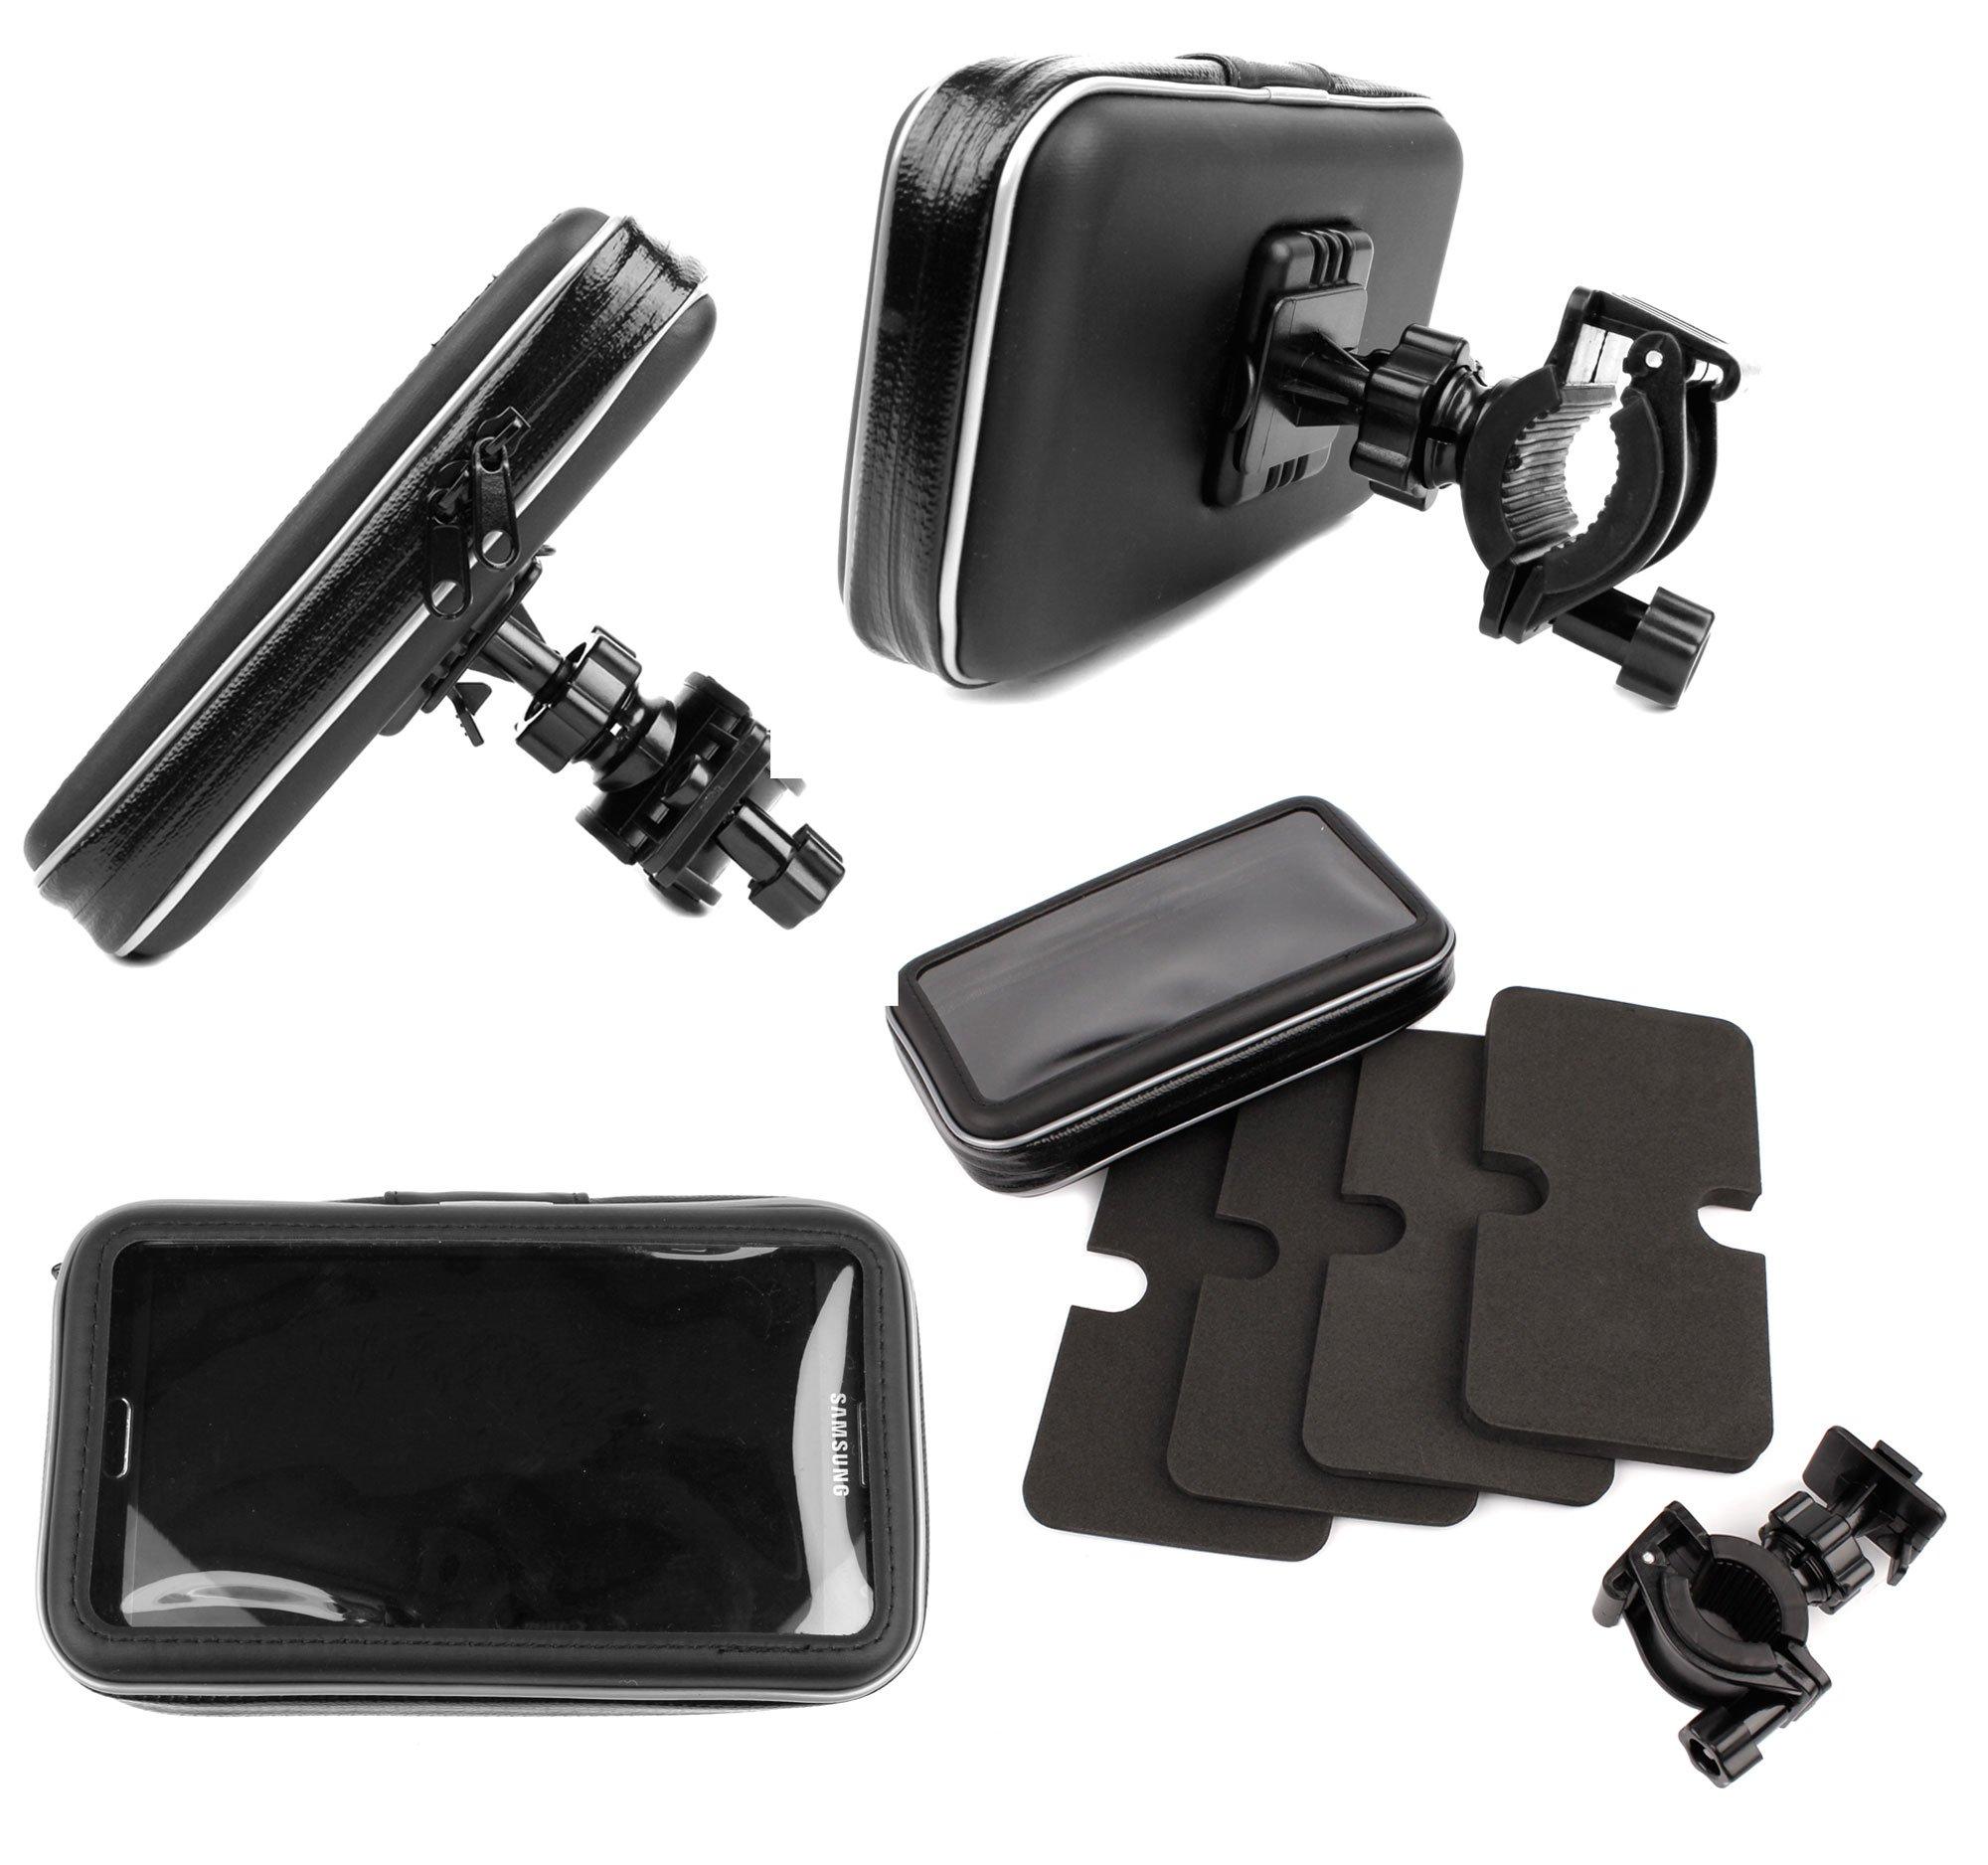 DURAGADGET Water-Resistant & Shock-Absorbing Cyclists' Satnav Case & Bike Handlebar GPS Mount - Compatible with Falk V600 | Vision 500 | Vision 700 Satnav